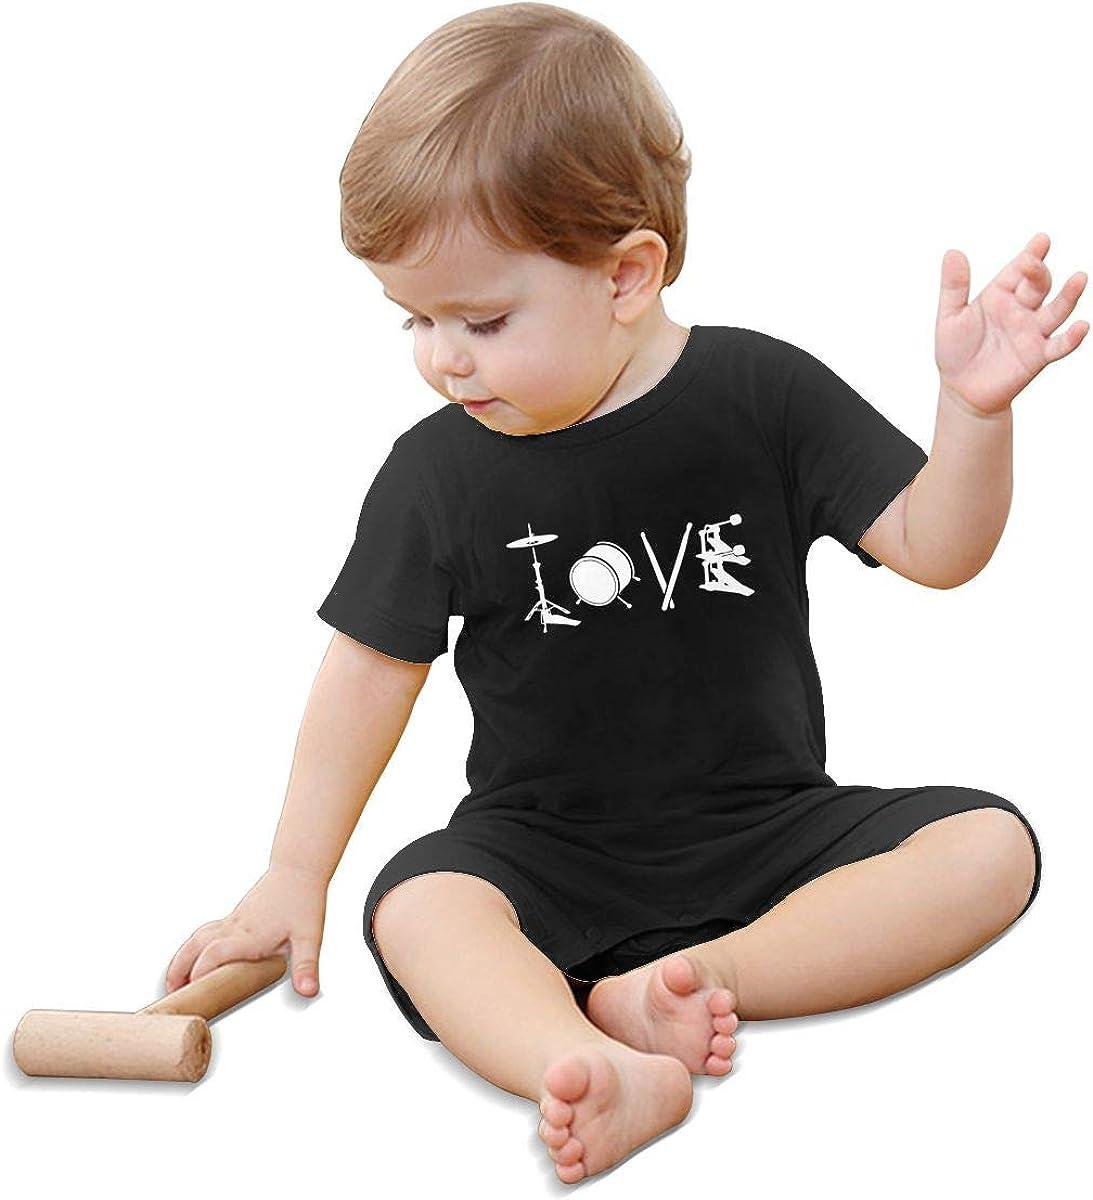 Love Drum Baby Boy Jumpsuit One Piece Baby Rompers